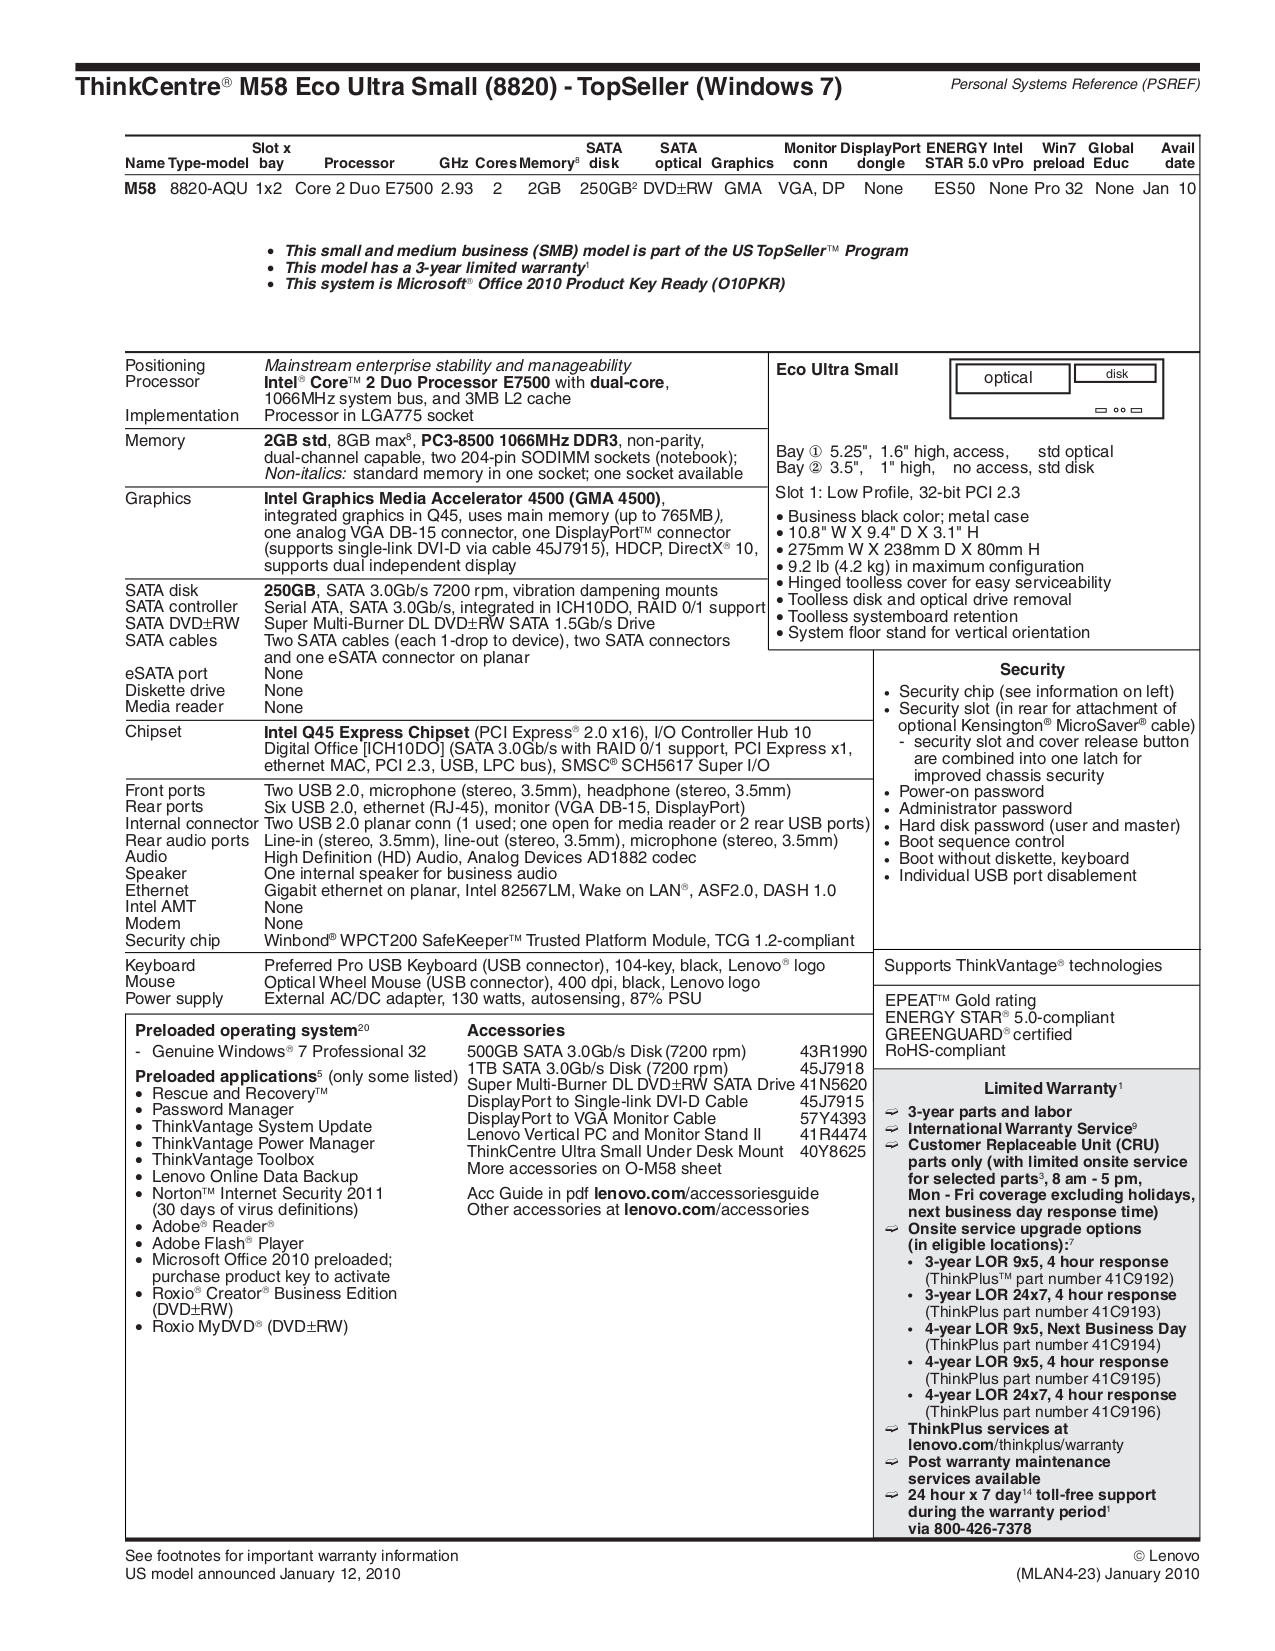 pdf for Lenovo Desktop ThinkCentre M58 8820 manual